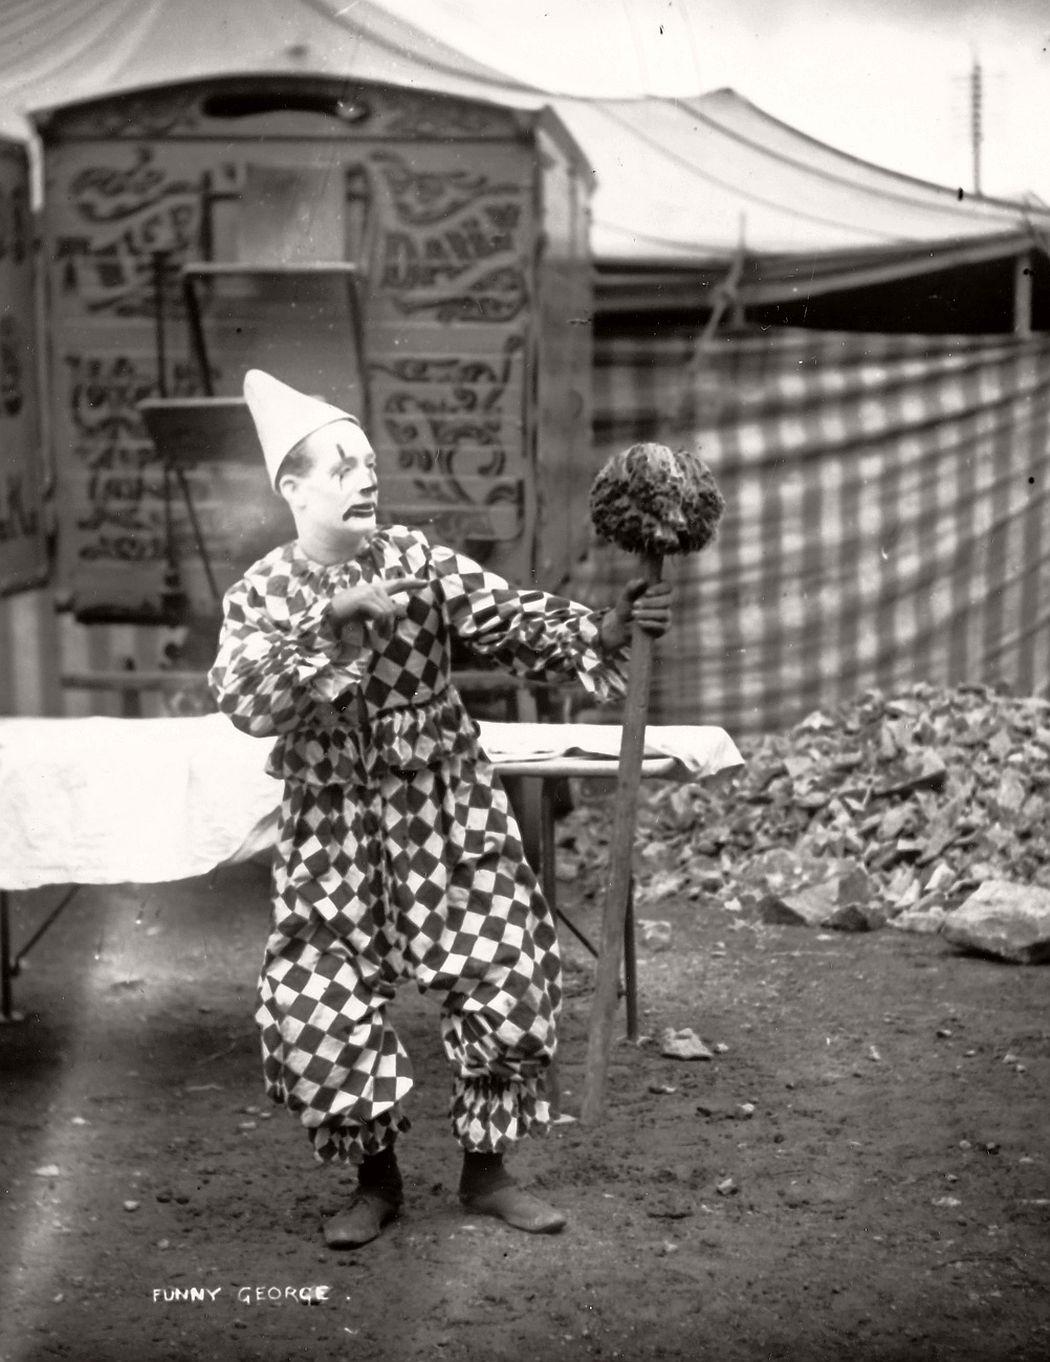 vintage-circus-performers-in-strabane-1910-1911-11